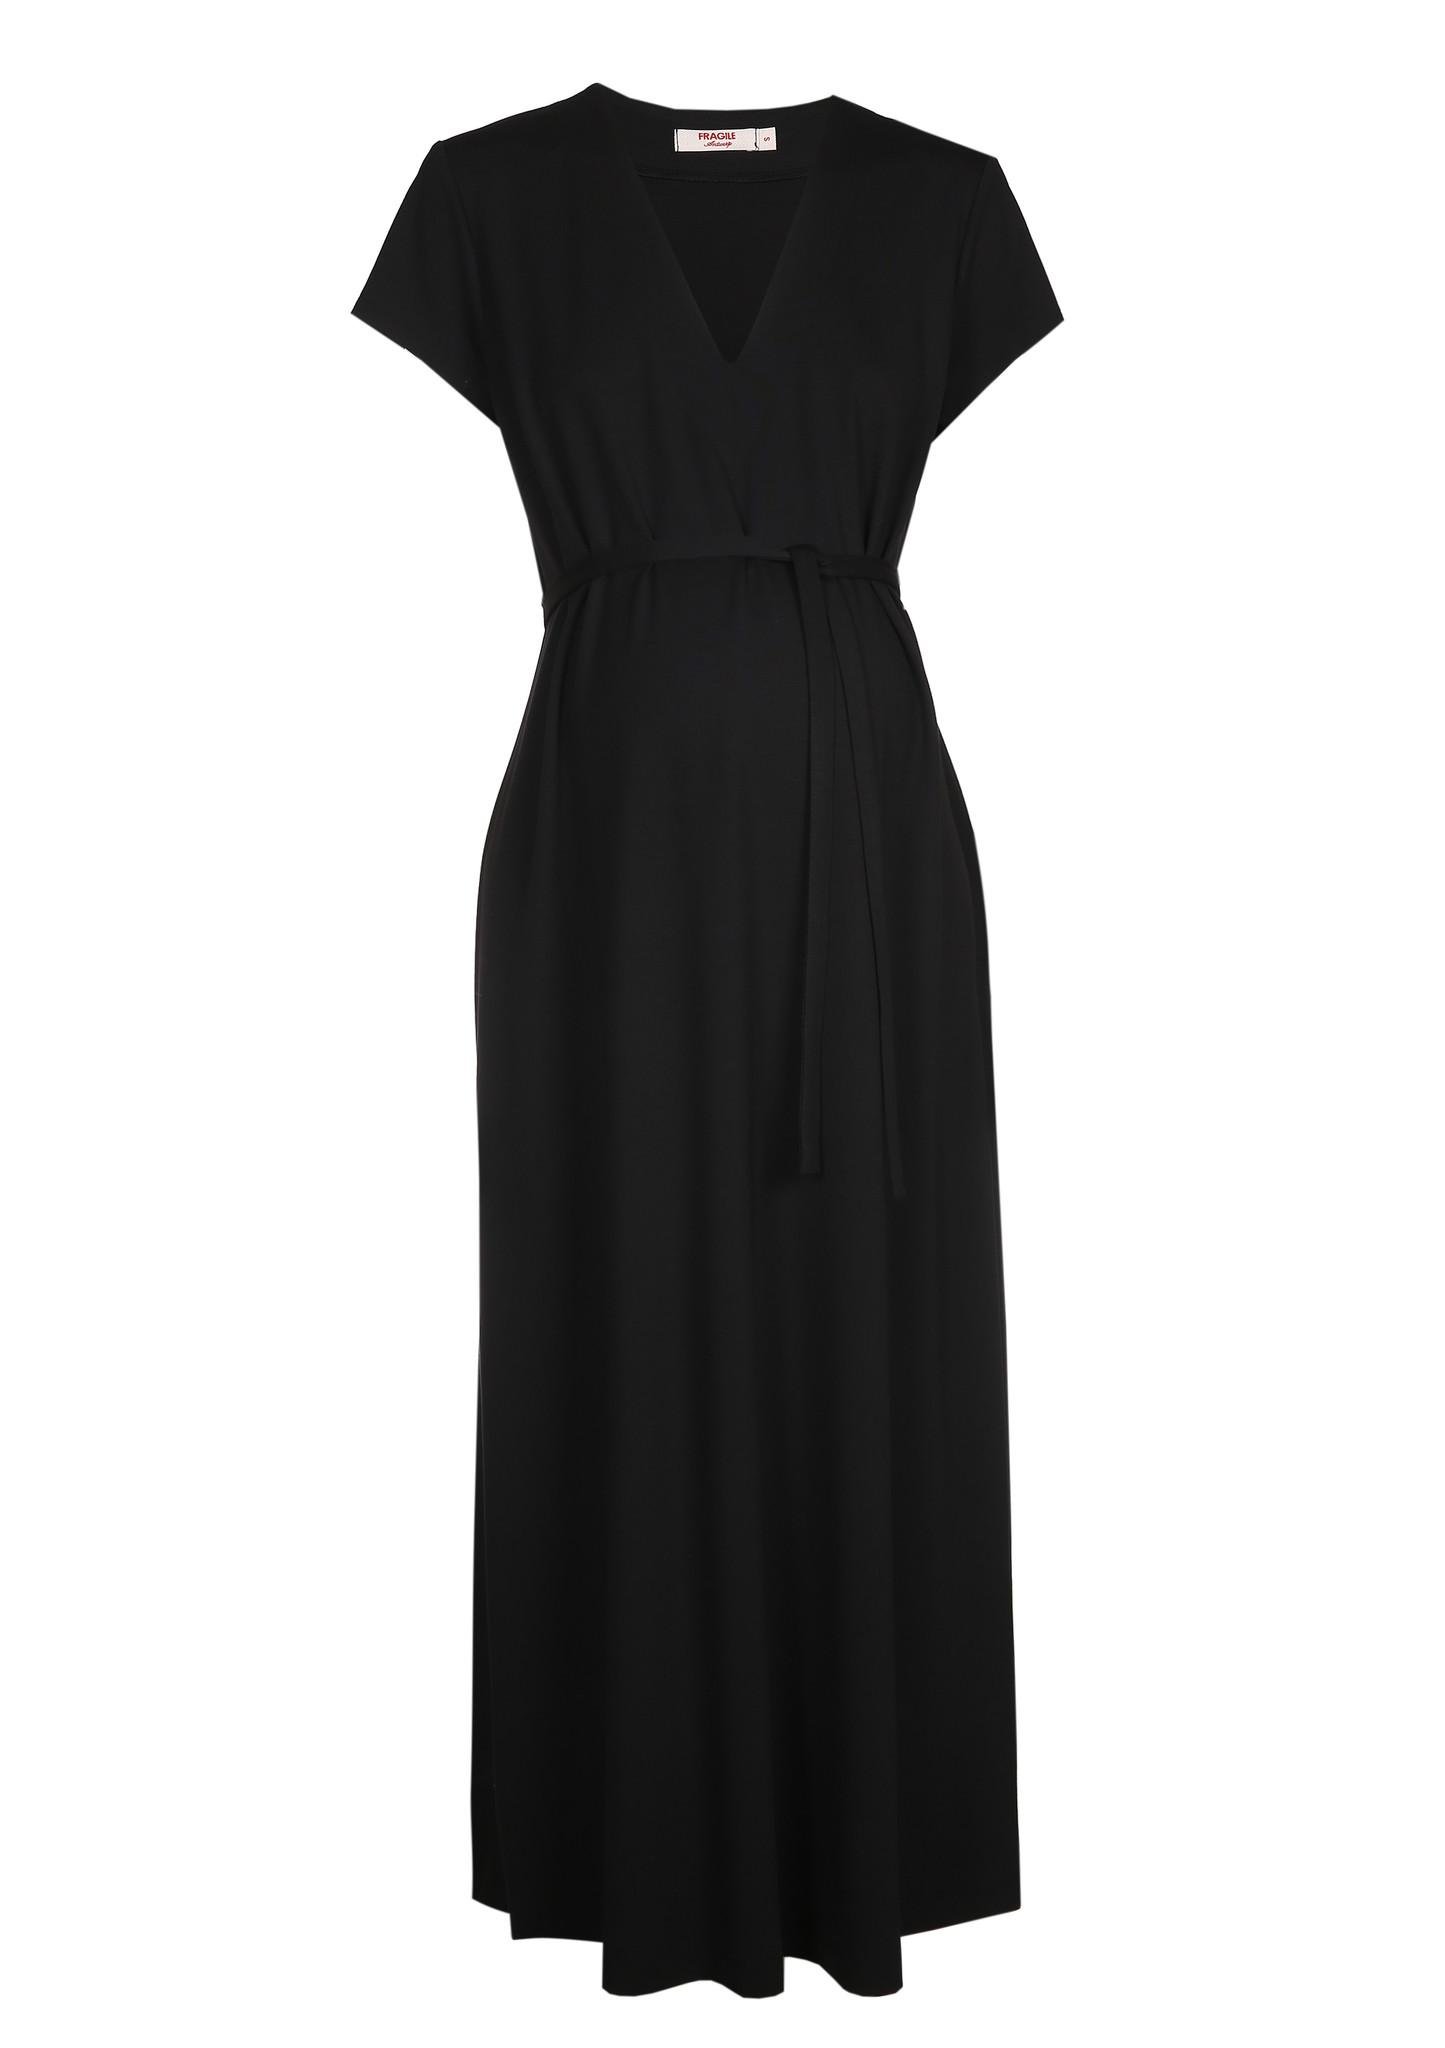 A-Line Dress Black-5